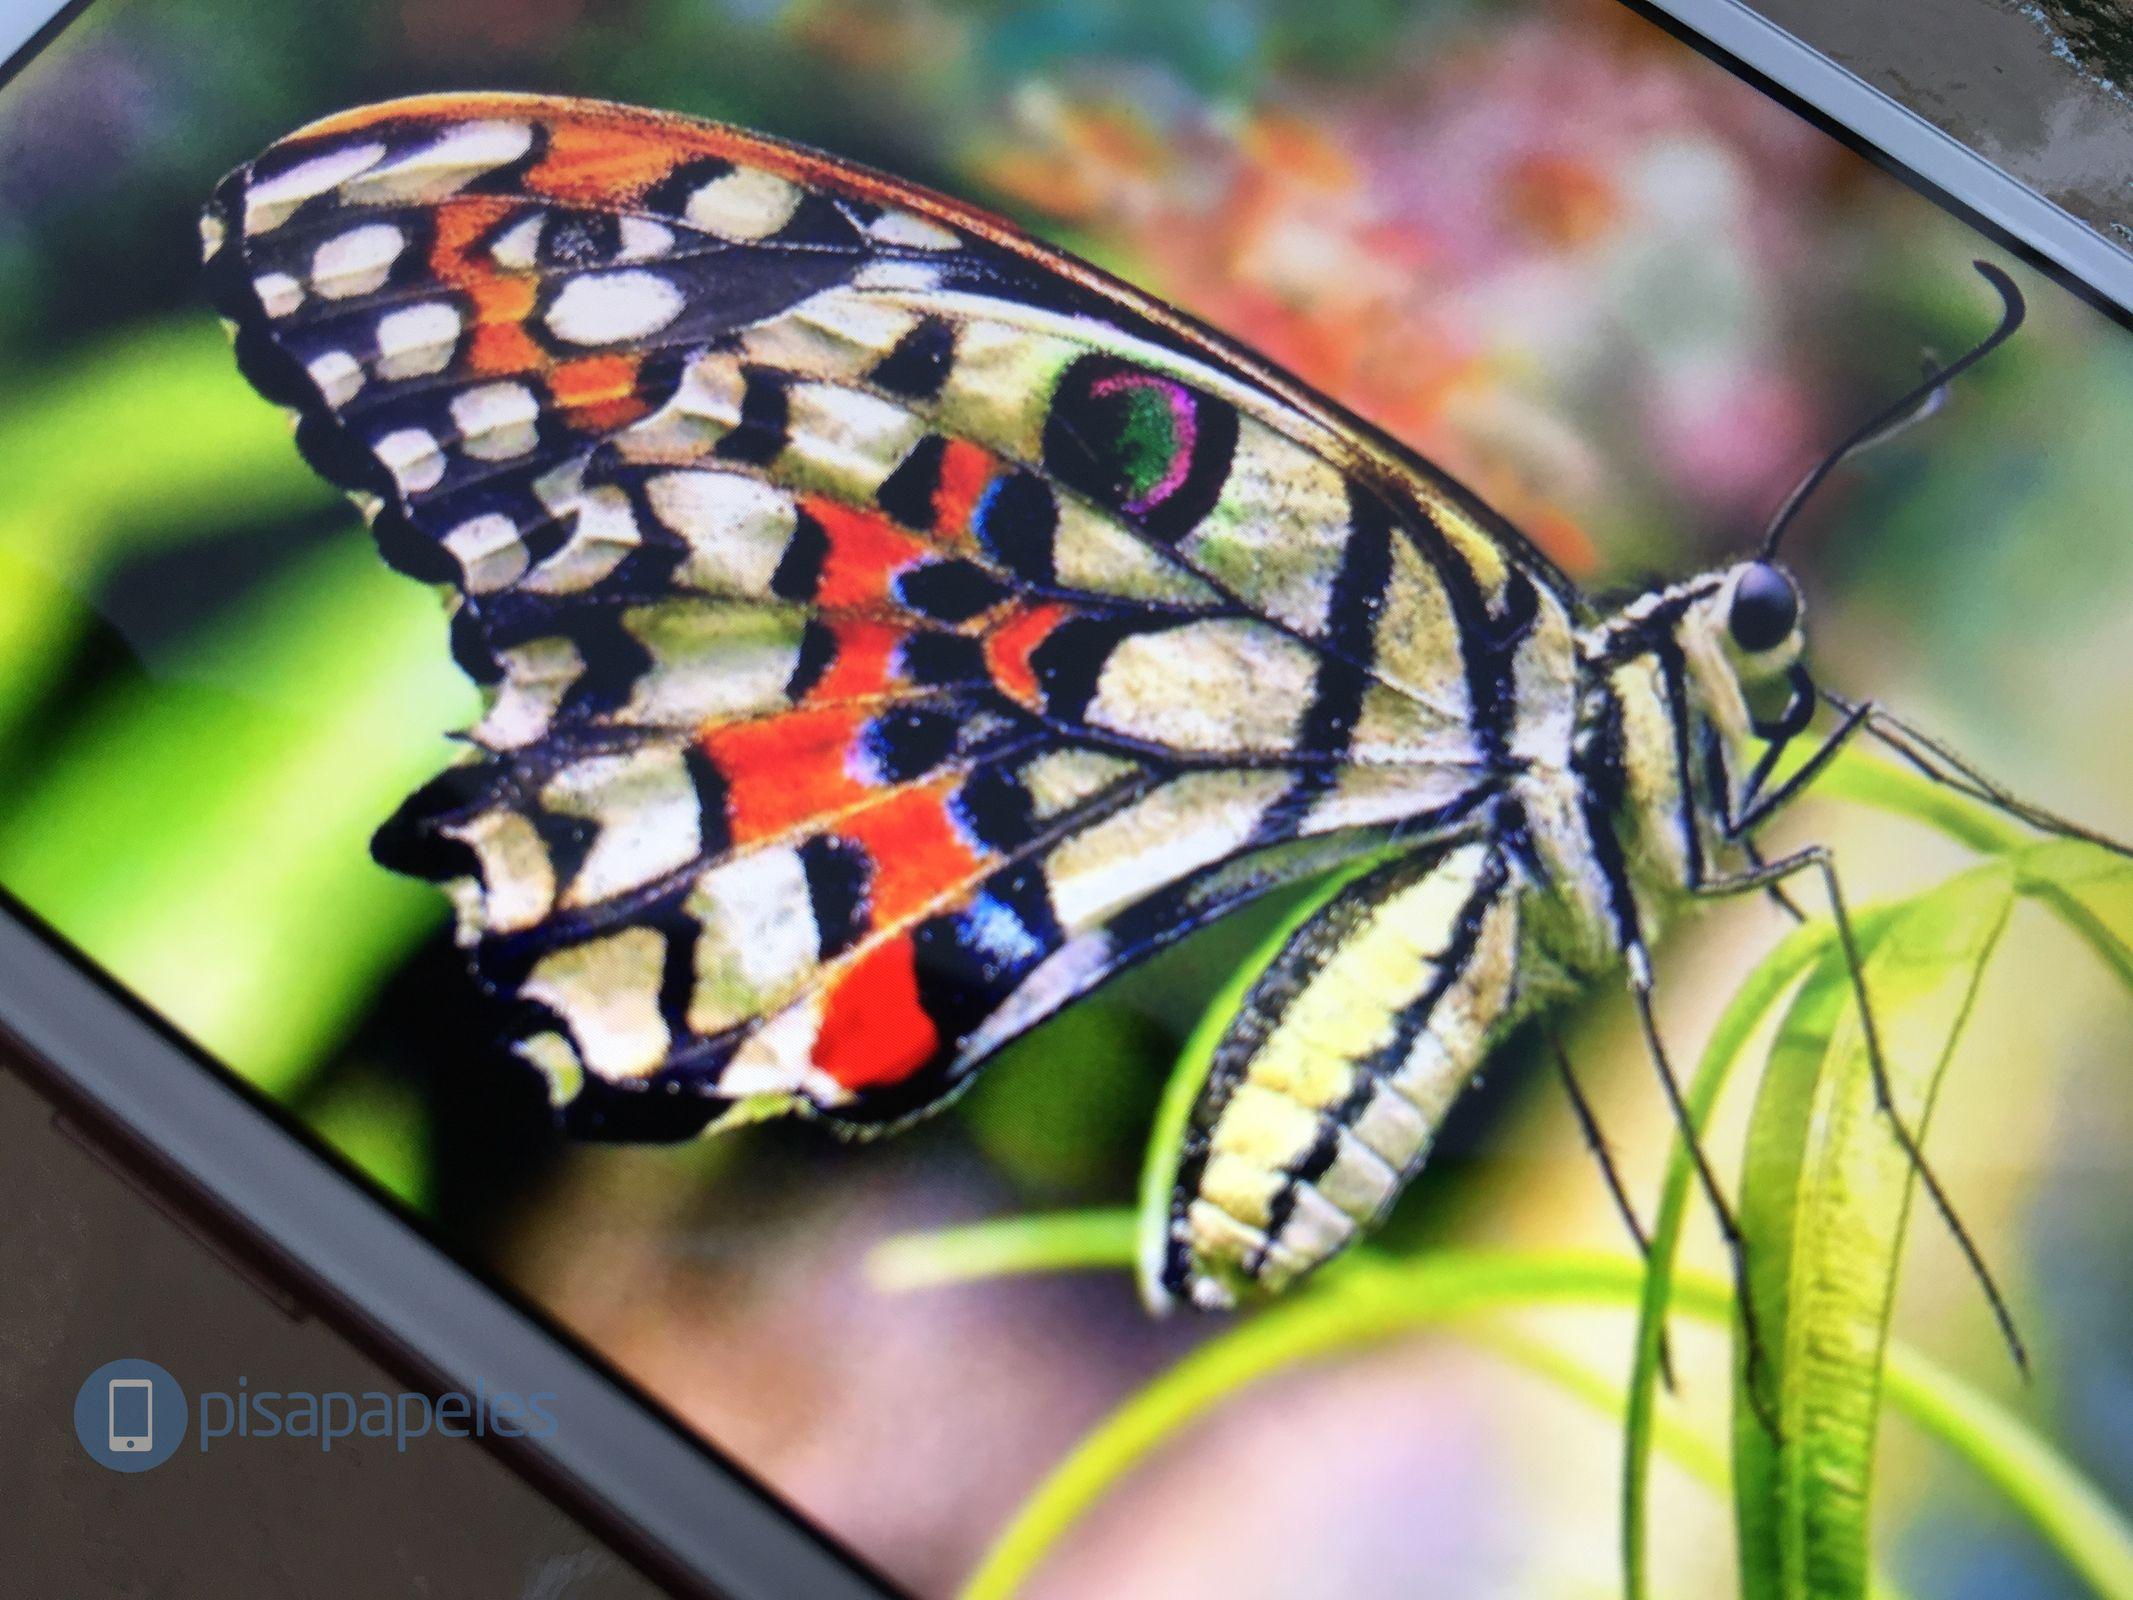 apple-iphone-7-pisapapeles-net_1